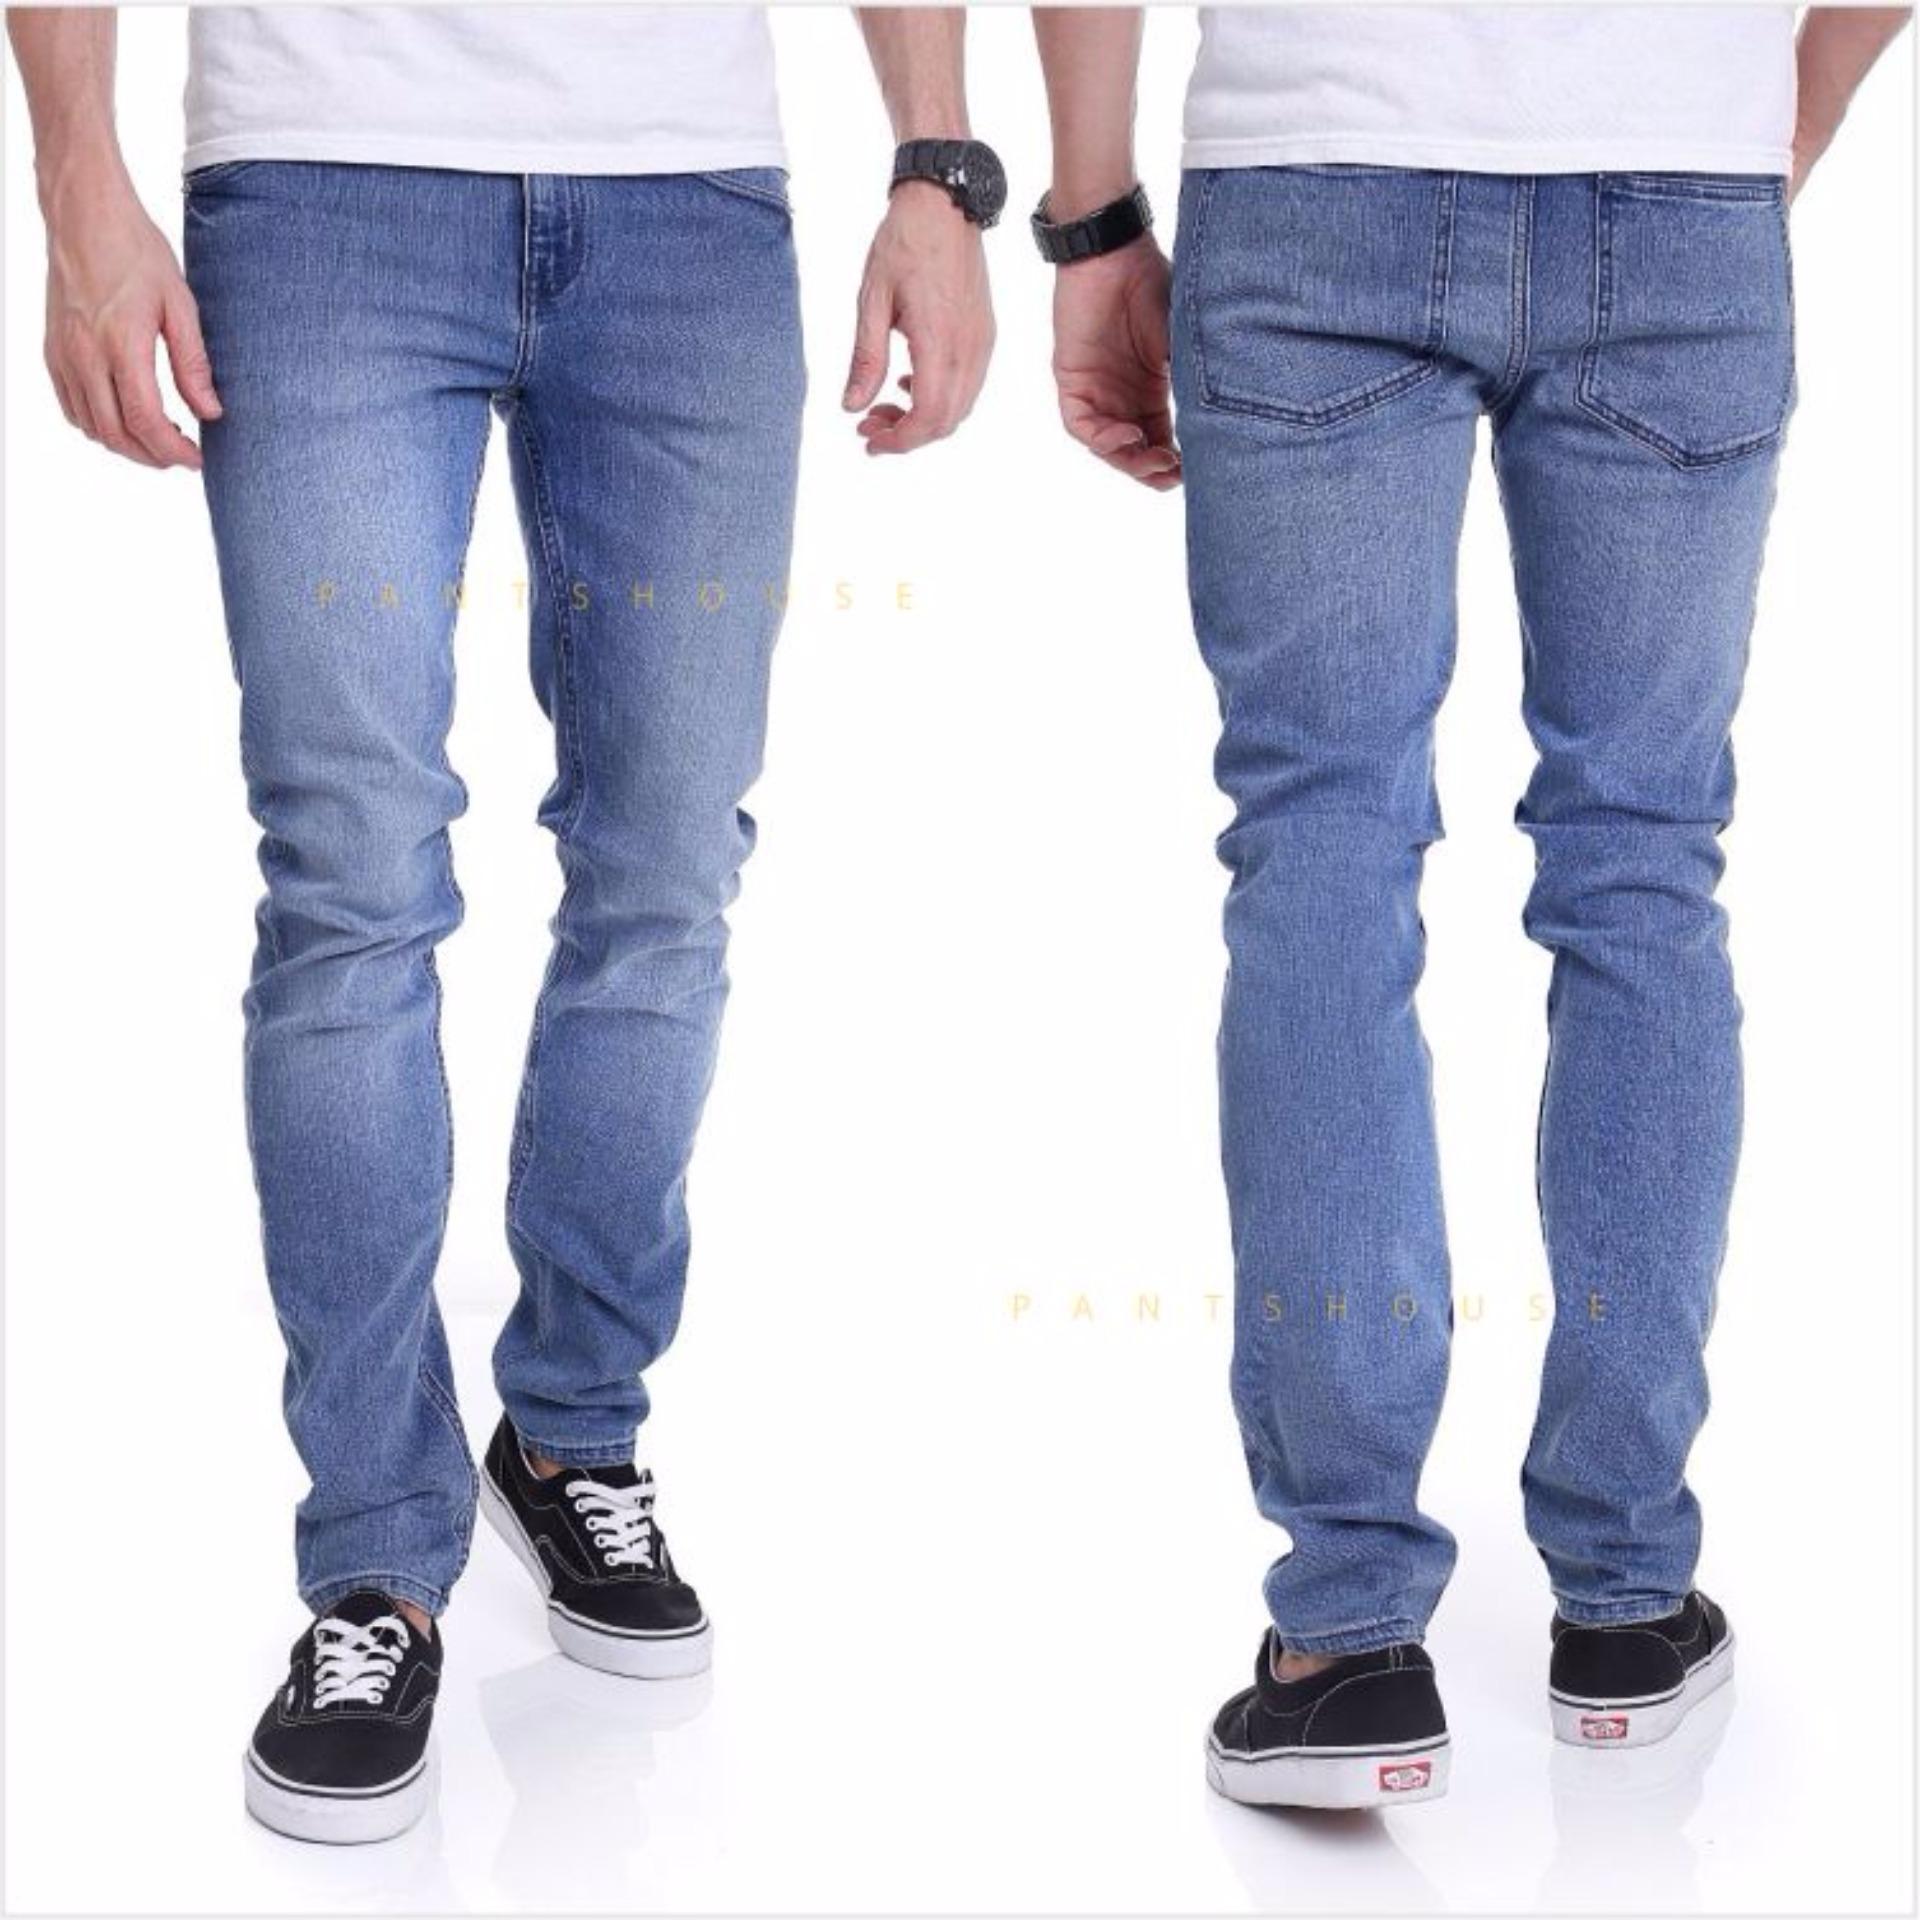 Ulasan Lengkap Id Celana Jeans Skyni Original Grade A